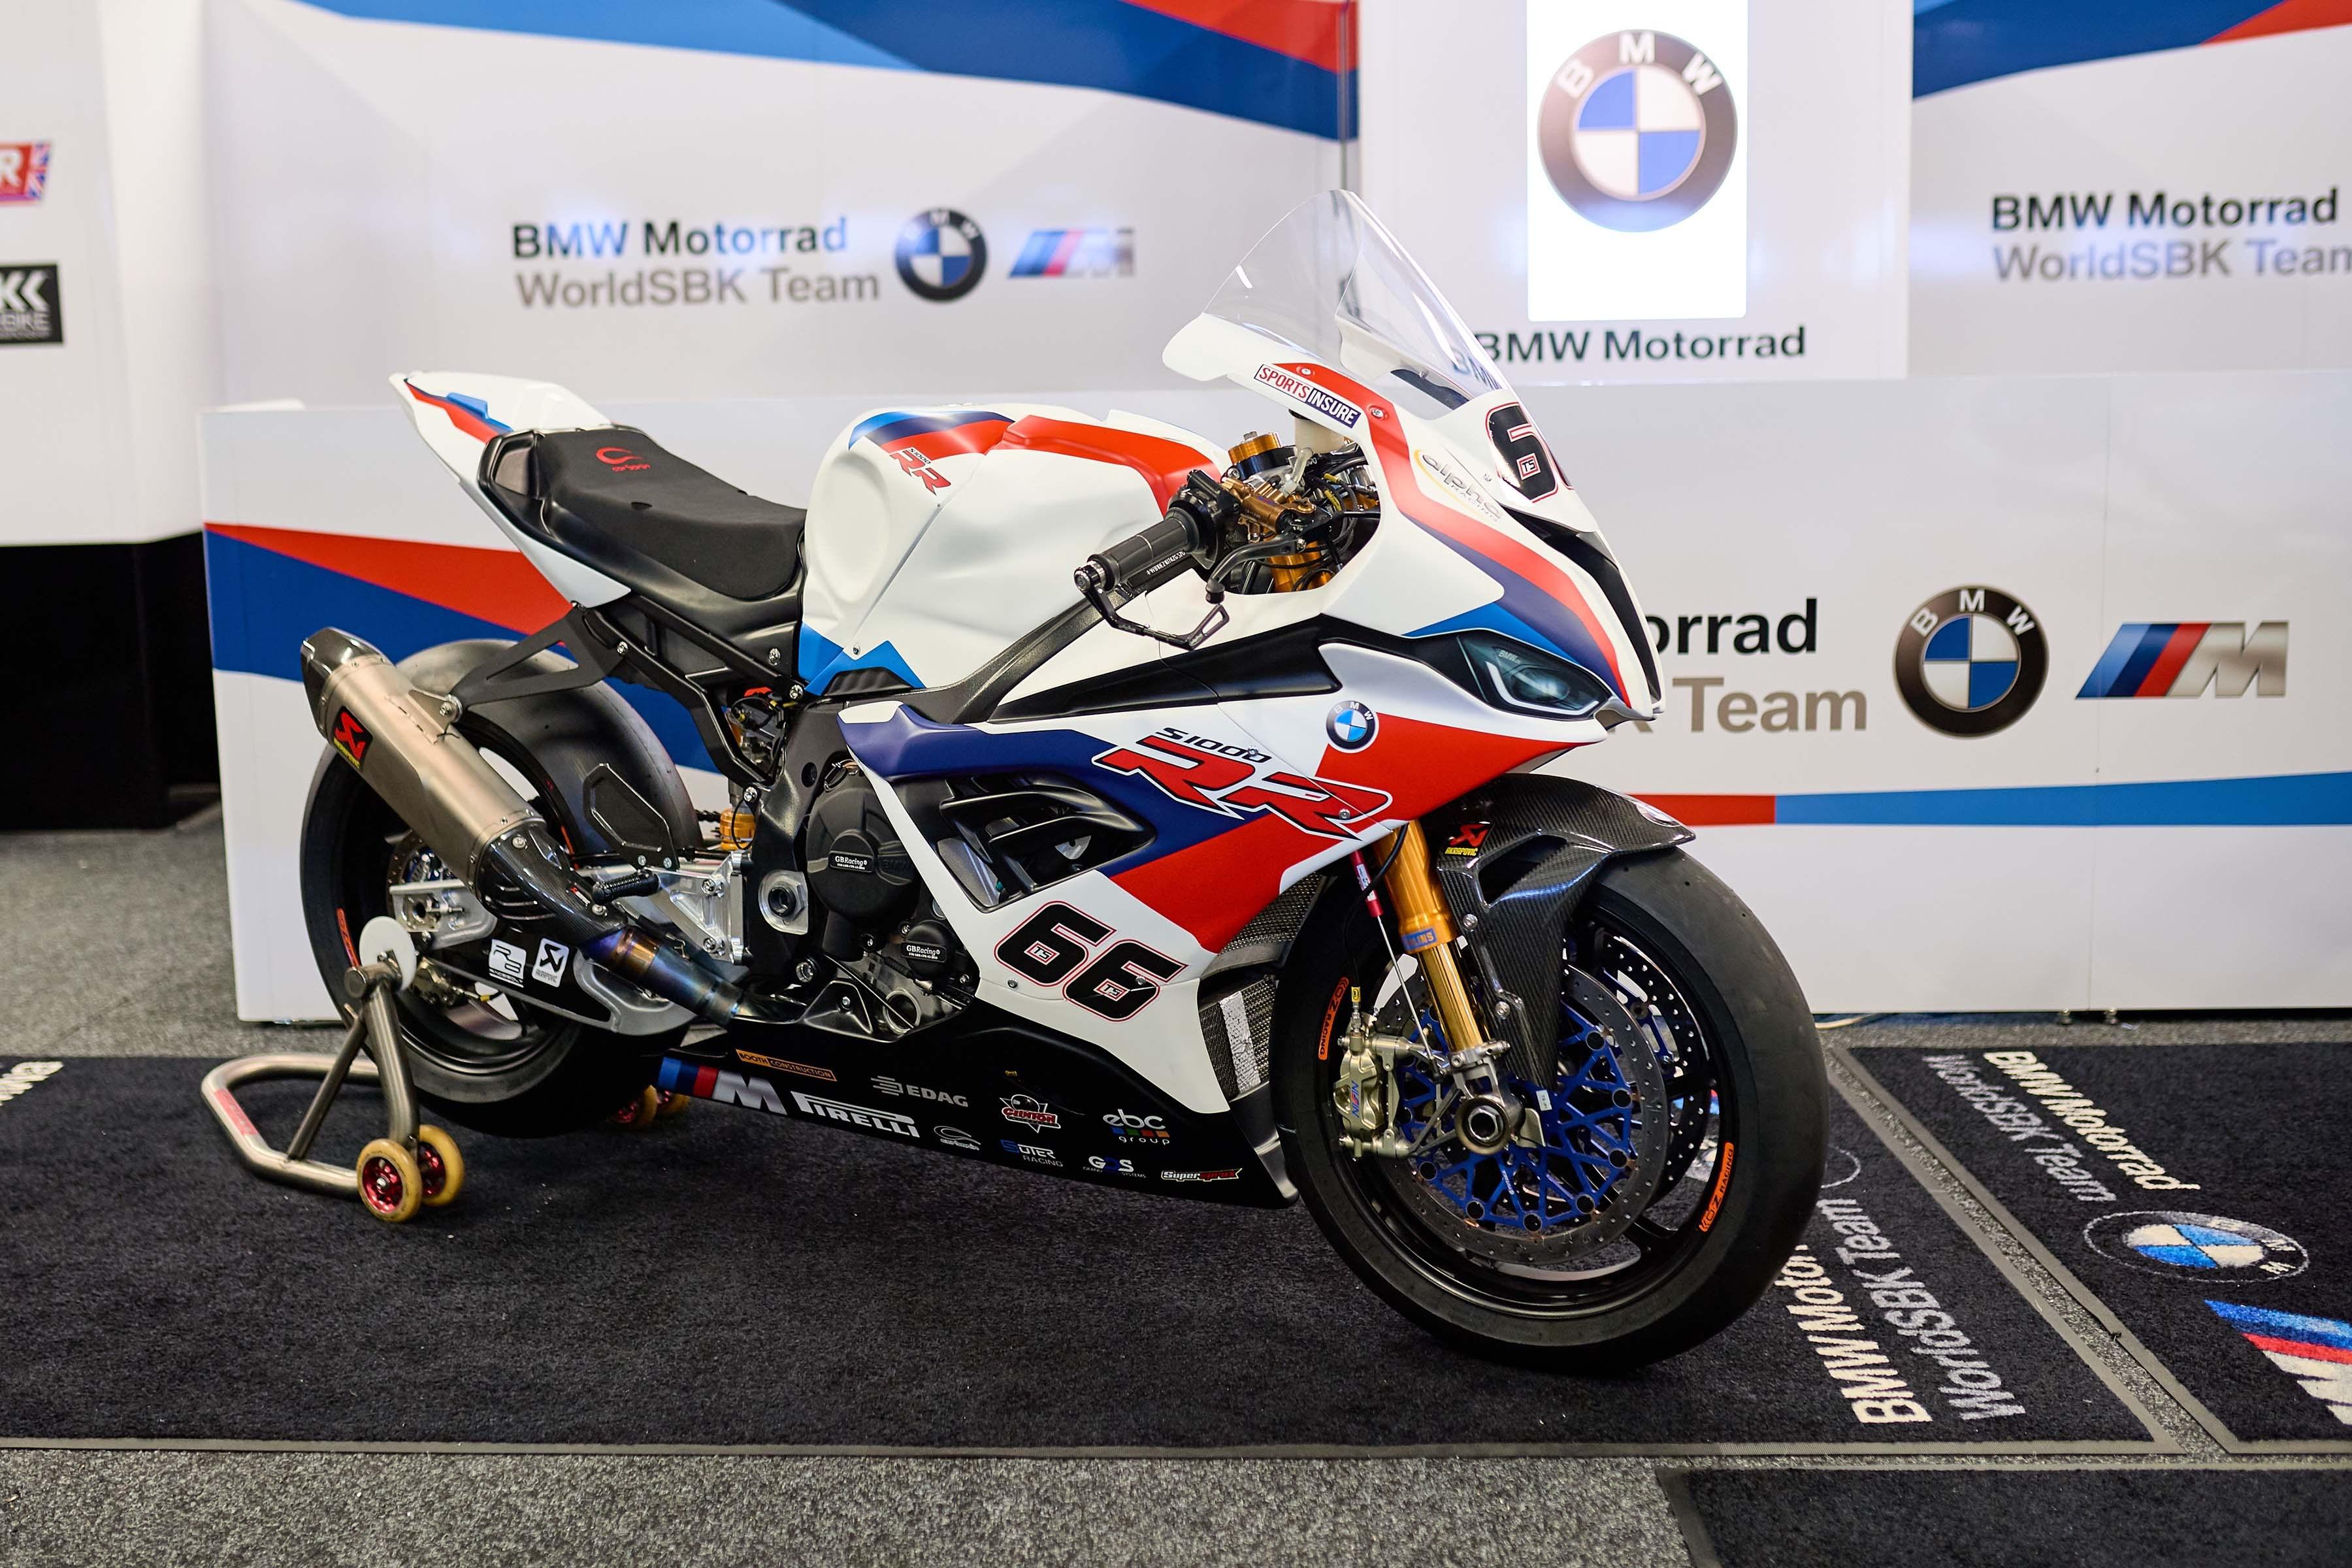 BMW S1000RR 2019 4K